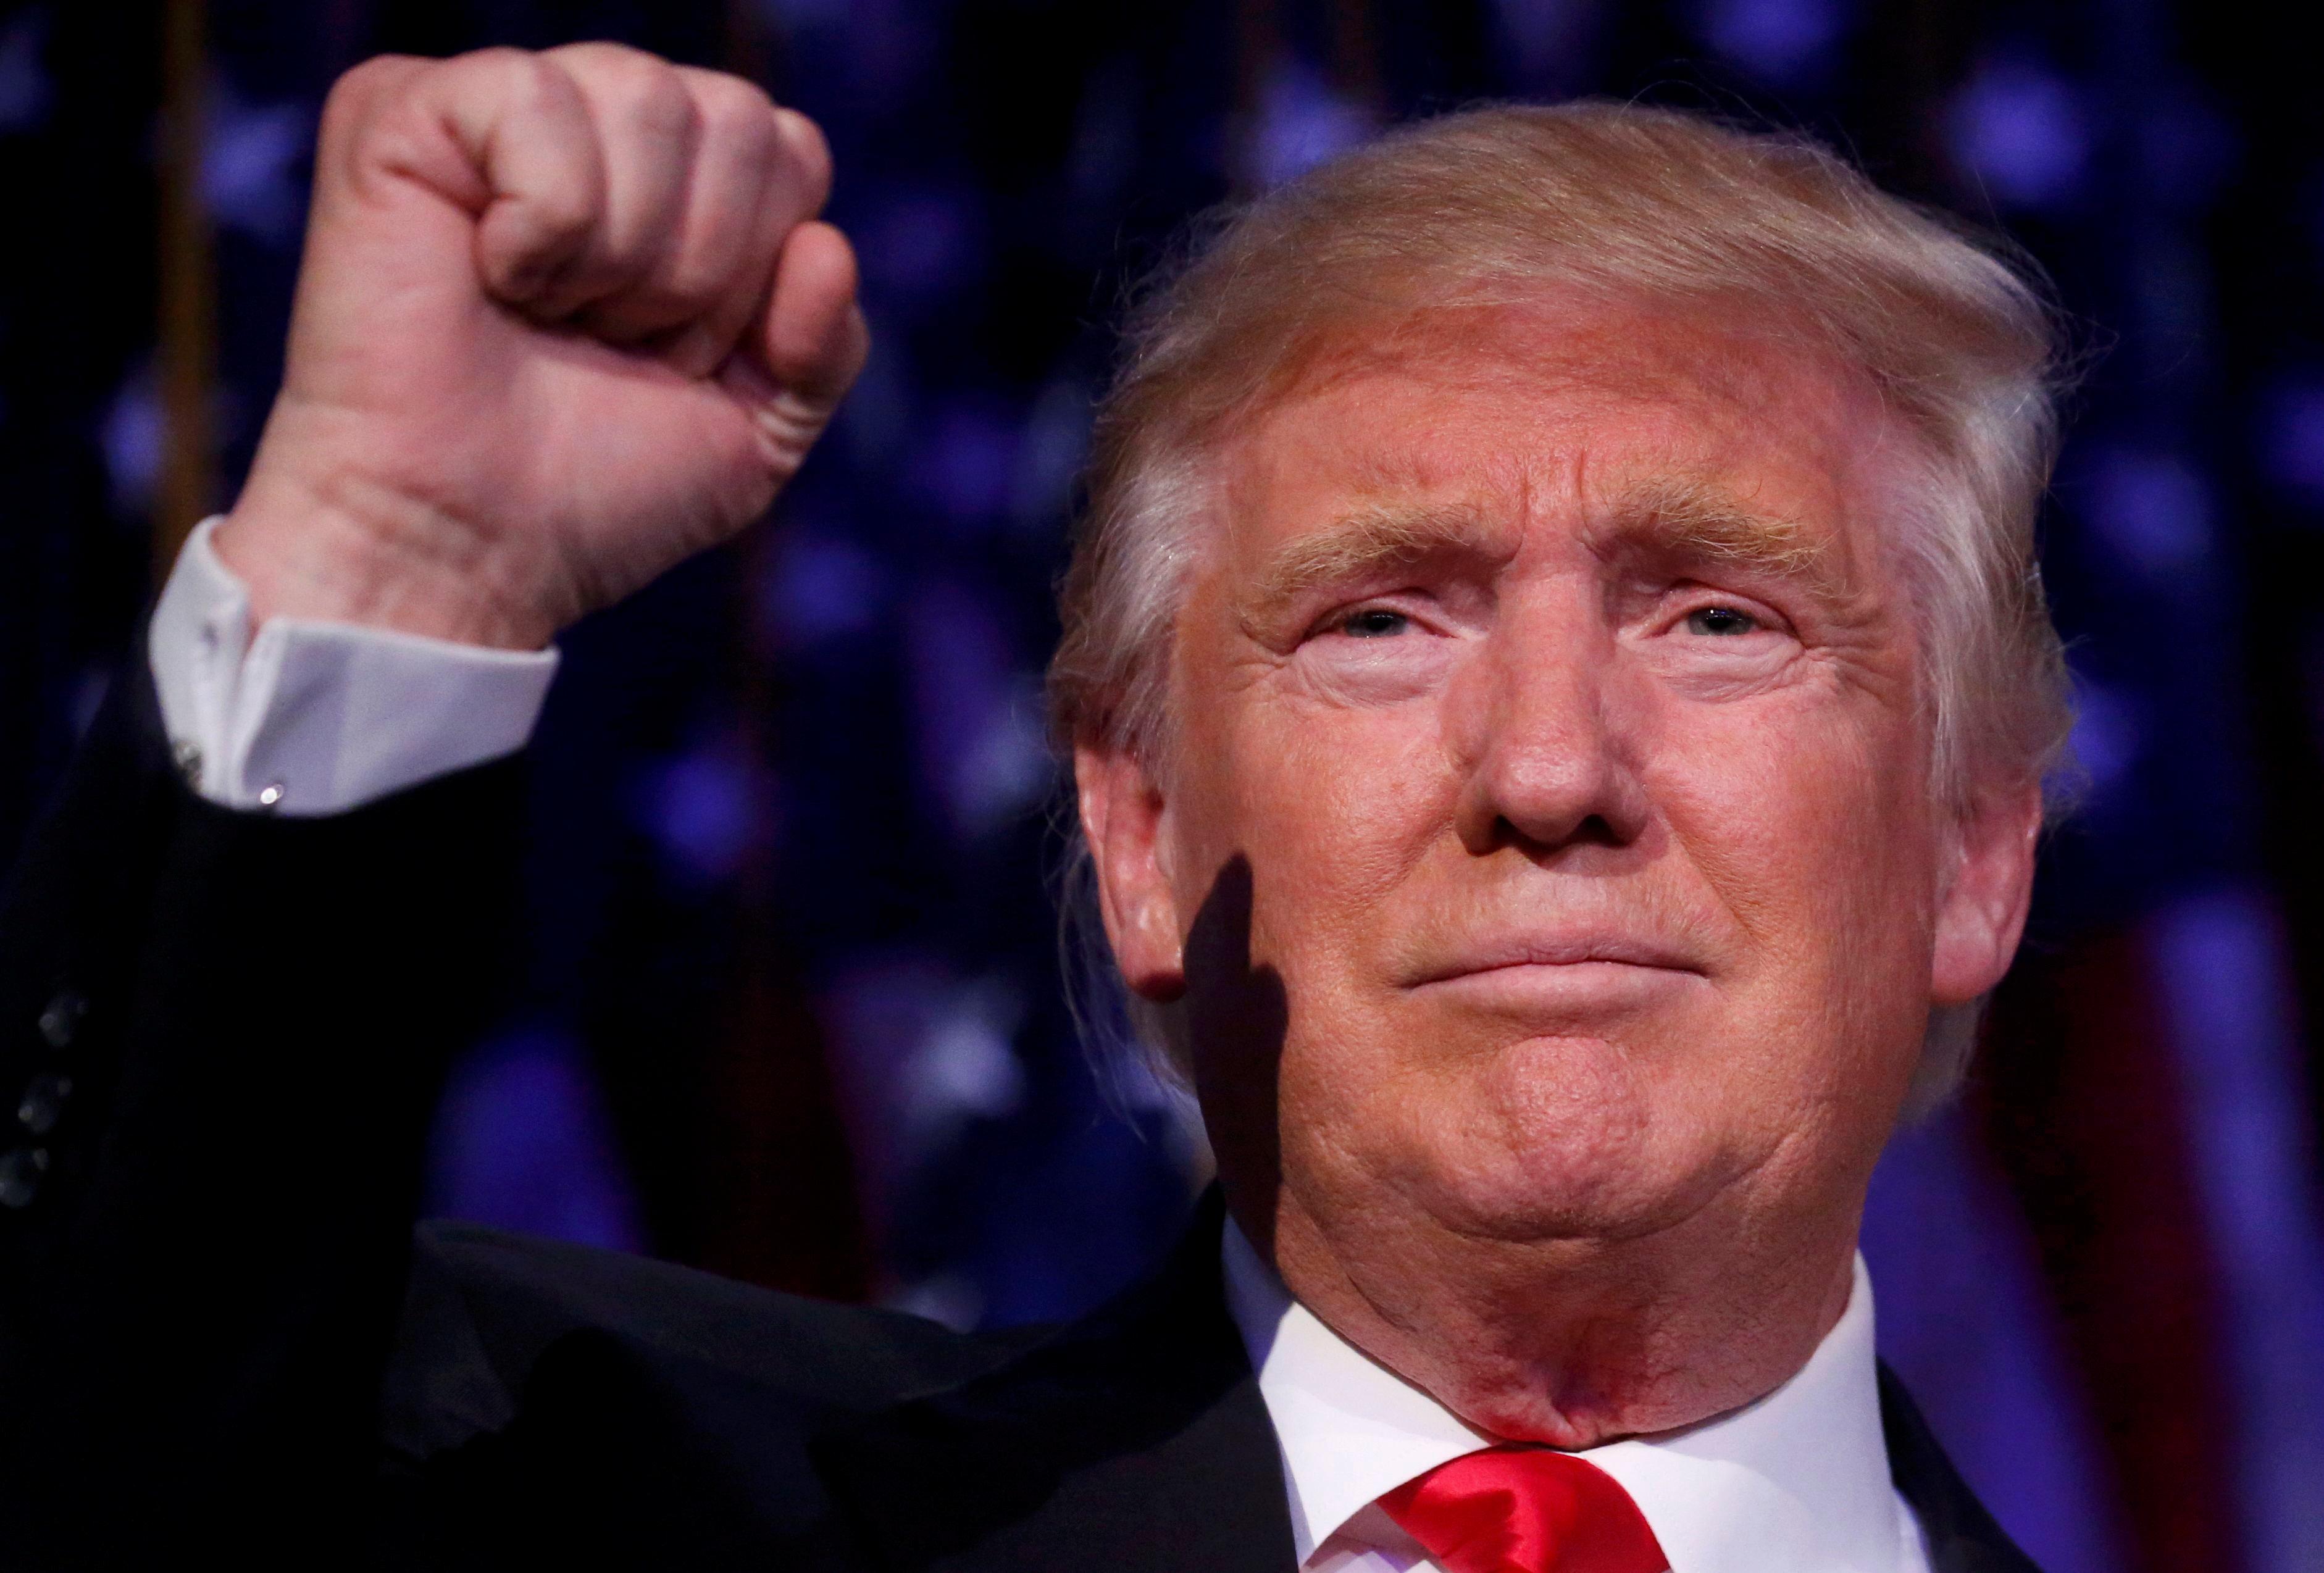 President-elect Donald Trump